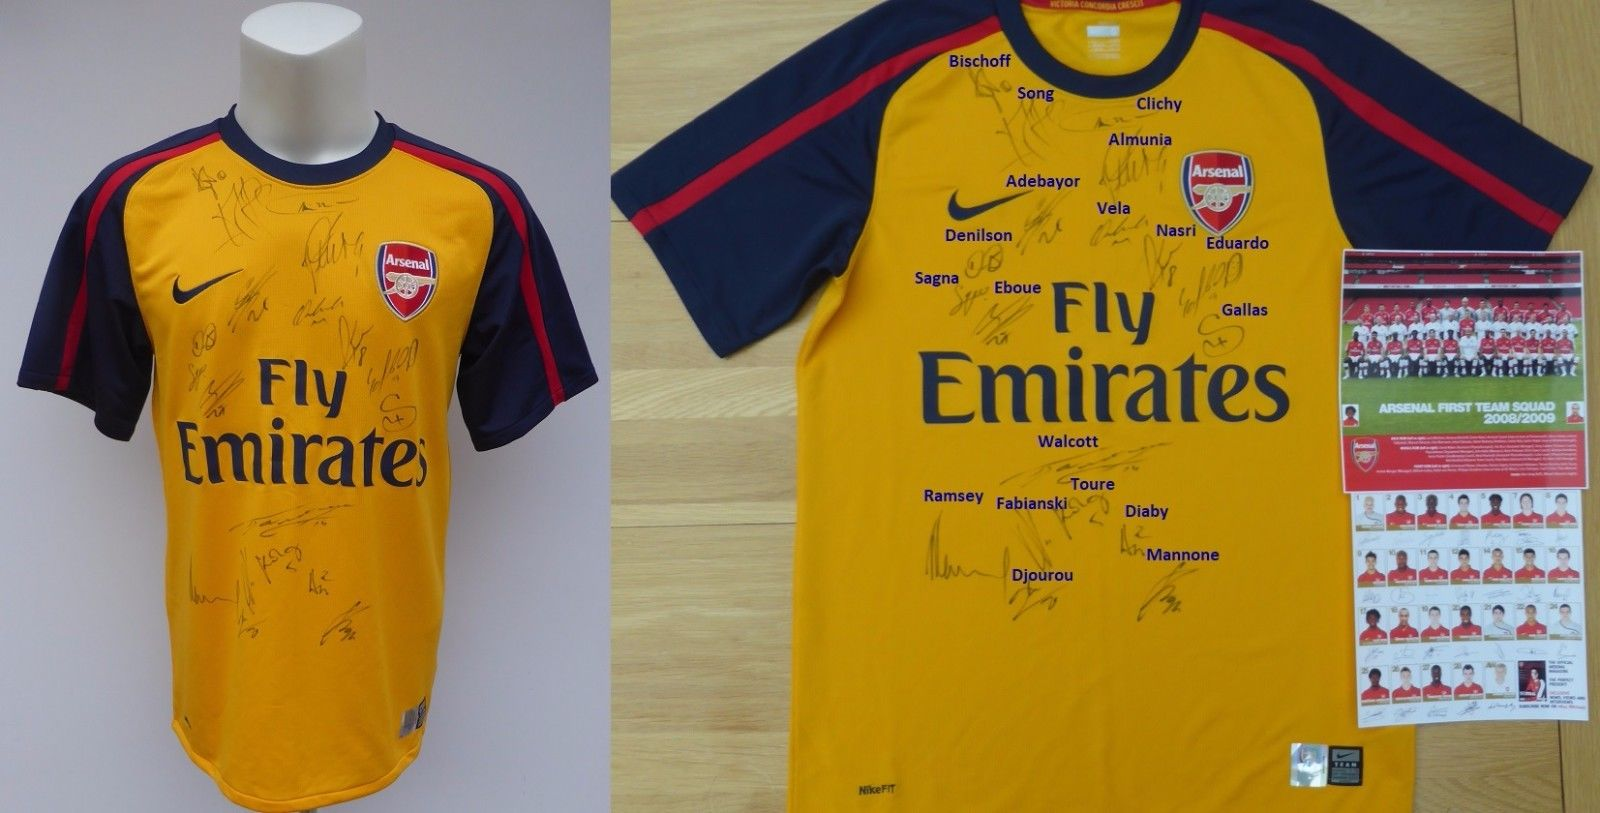 51be3d40b 2008-09 Arsenal Away Shirt Squad Signed inc. Ramsey